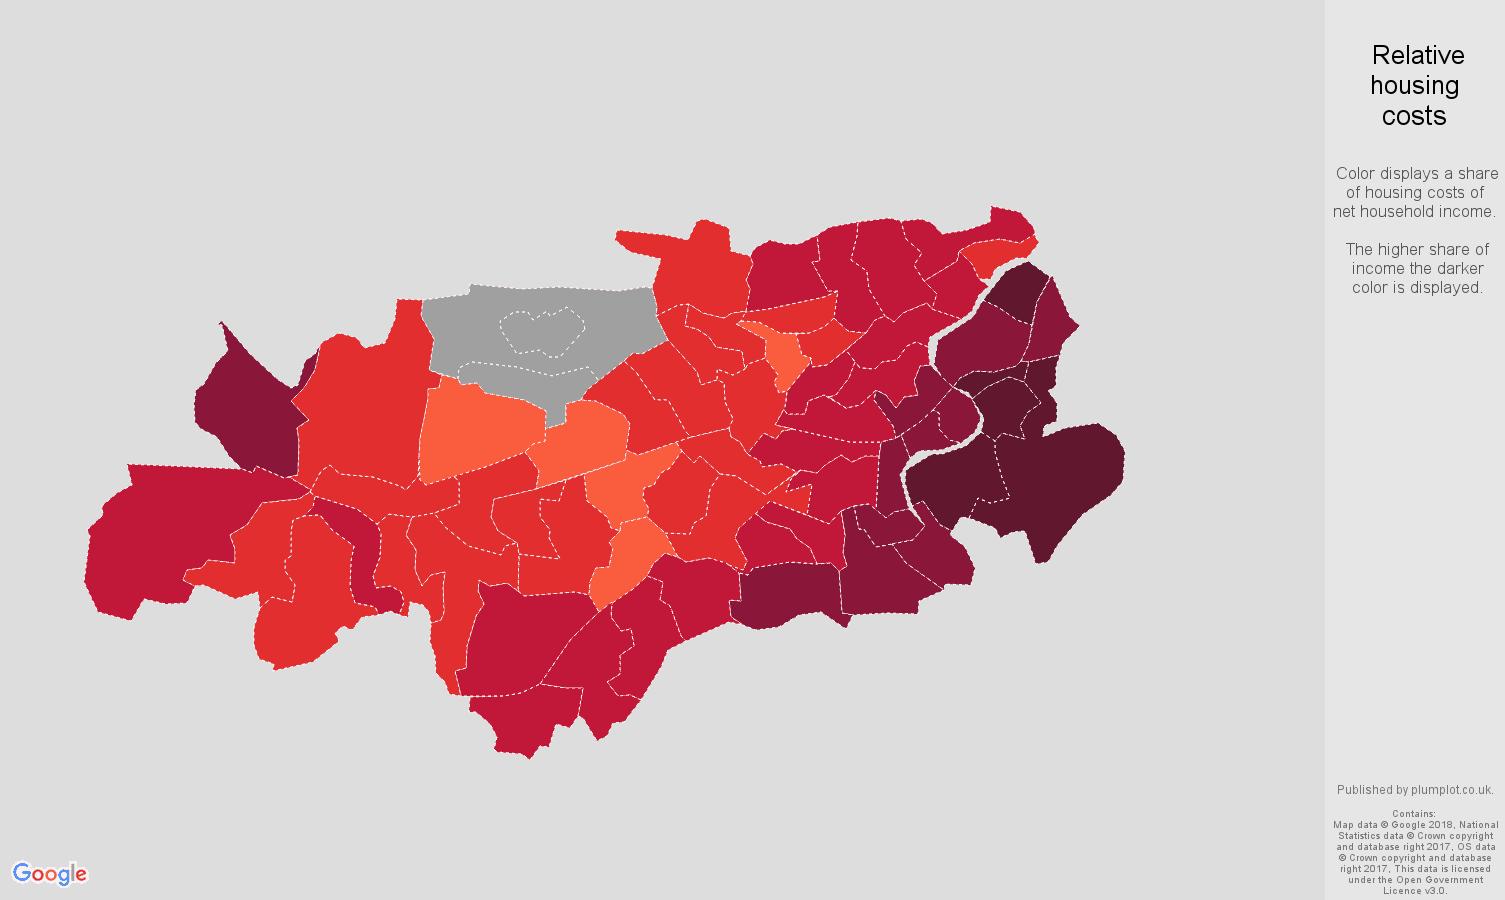 Twickenham relative housing costs map